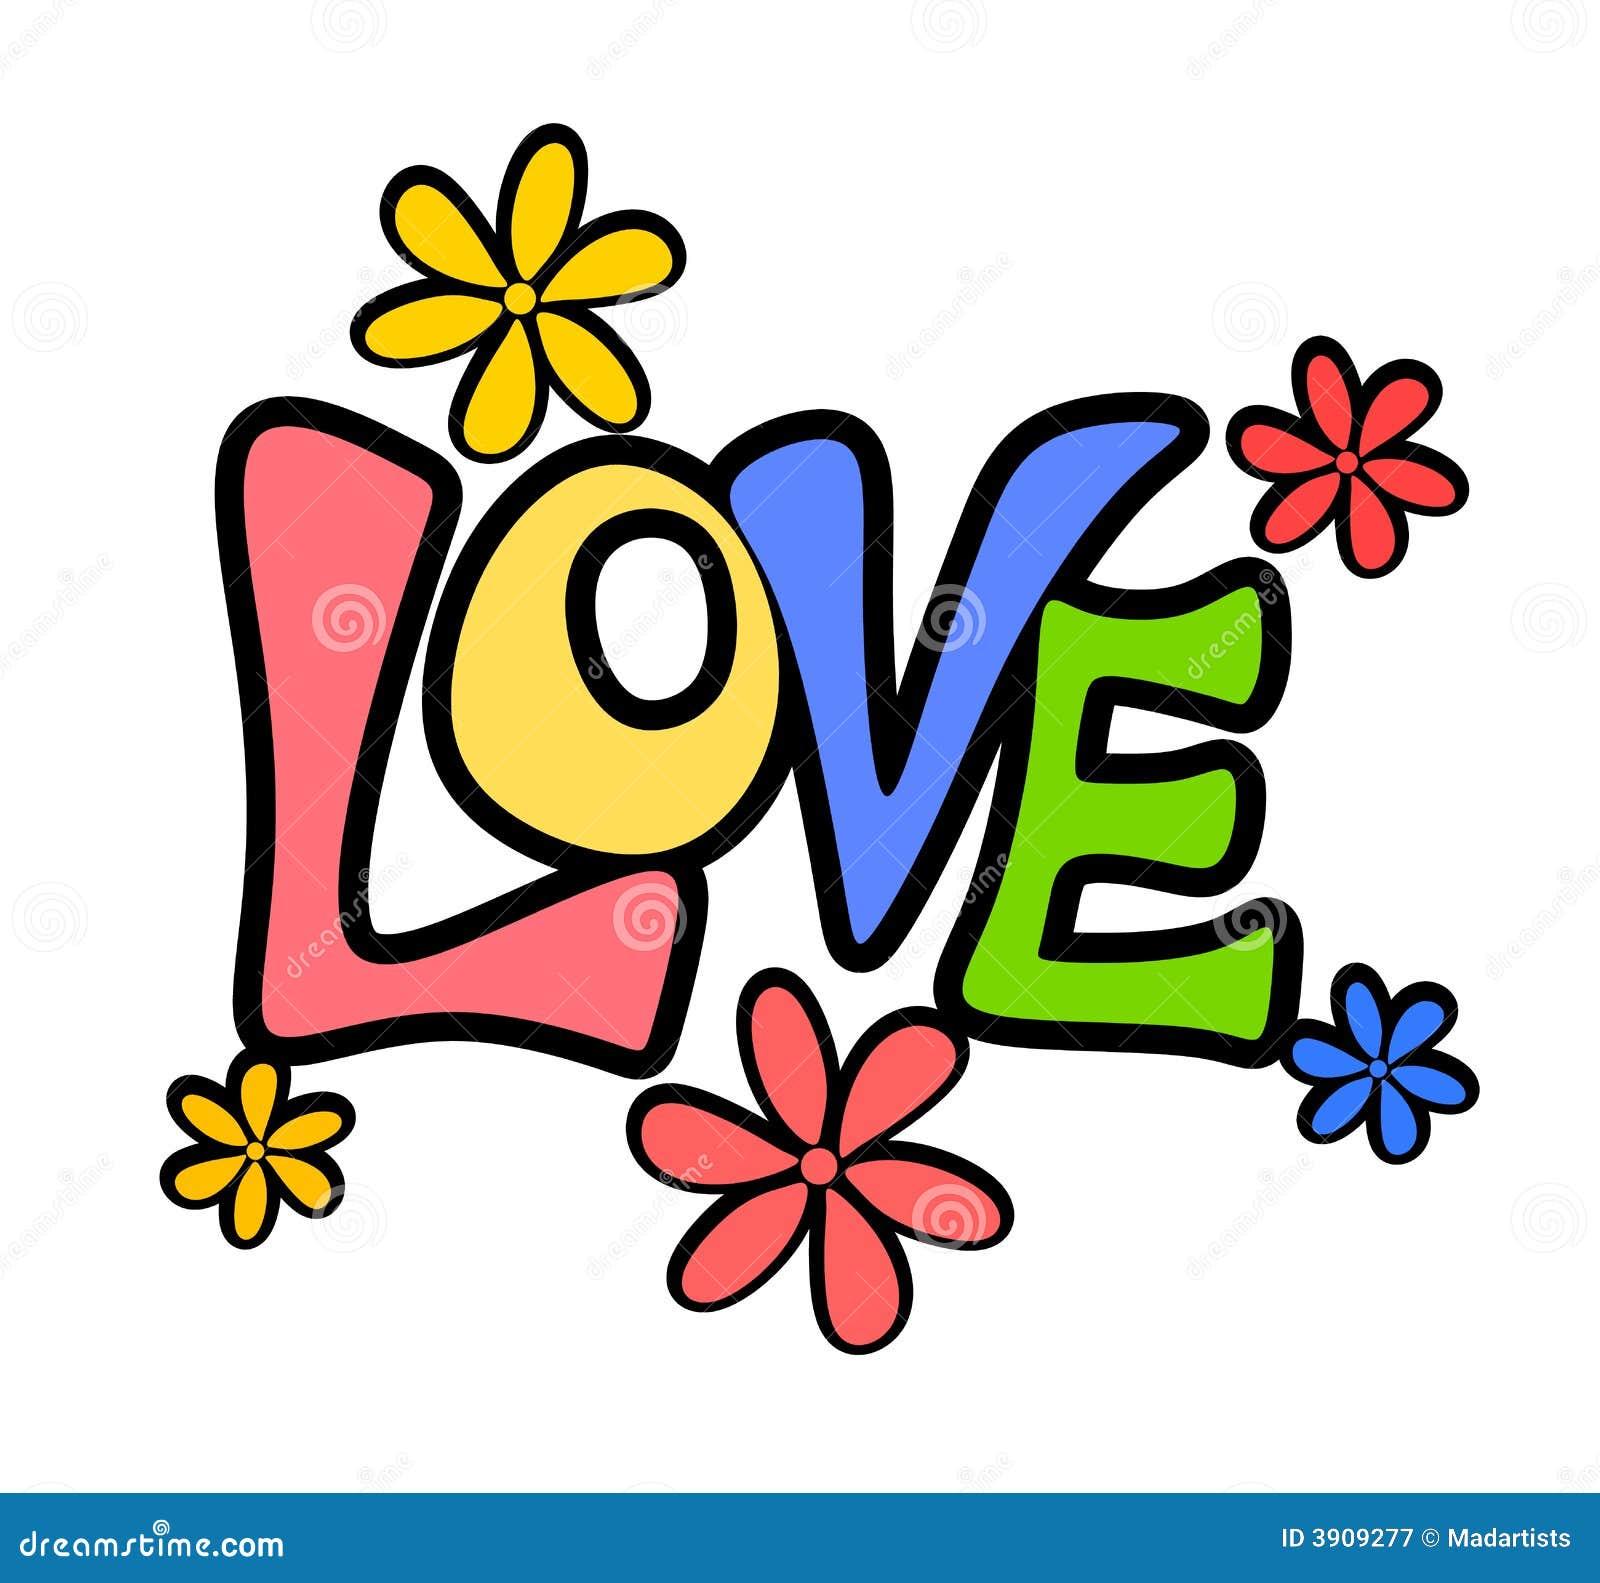 Retro Valentine Love Flowers Logo Or Banner Royalty Free ...